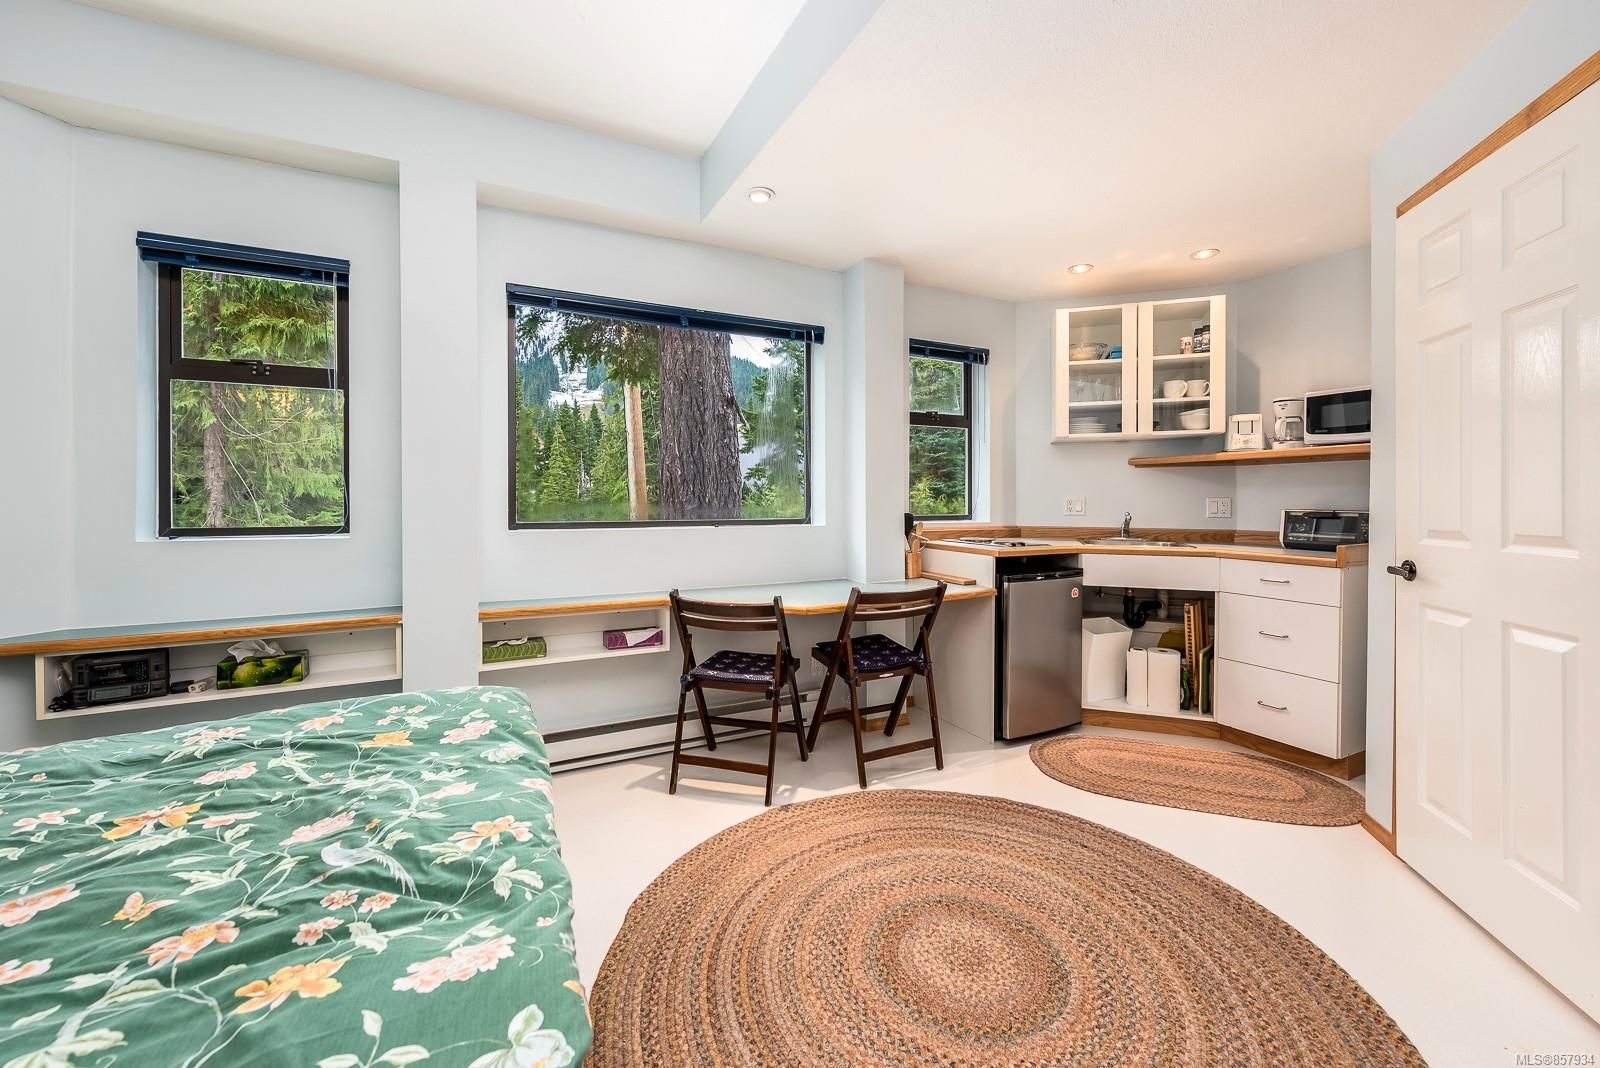 Photo 16: Photos: 998 STRATA Way in : CV Mt Washington House for sale (Comox Valley)  : MLS®# 857934